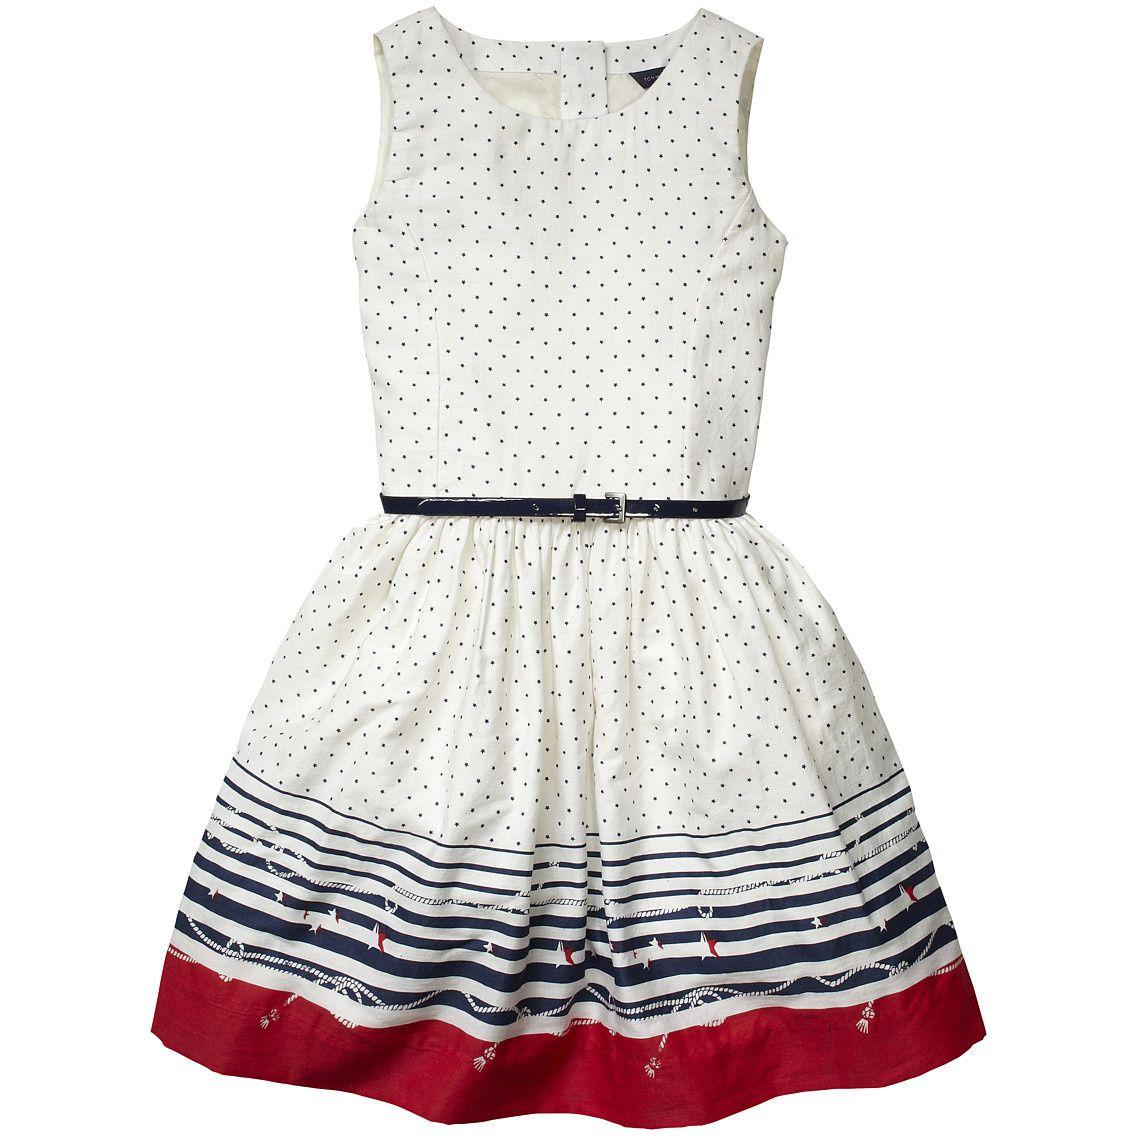 Dahlia Ärmellos Kleid www.lyoness.net/internal/at/Products/1-sonstige/48204239-dahlia-armellos-kleid